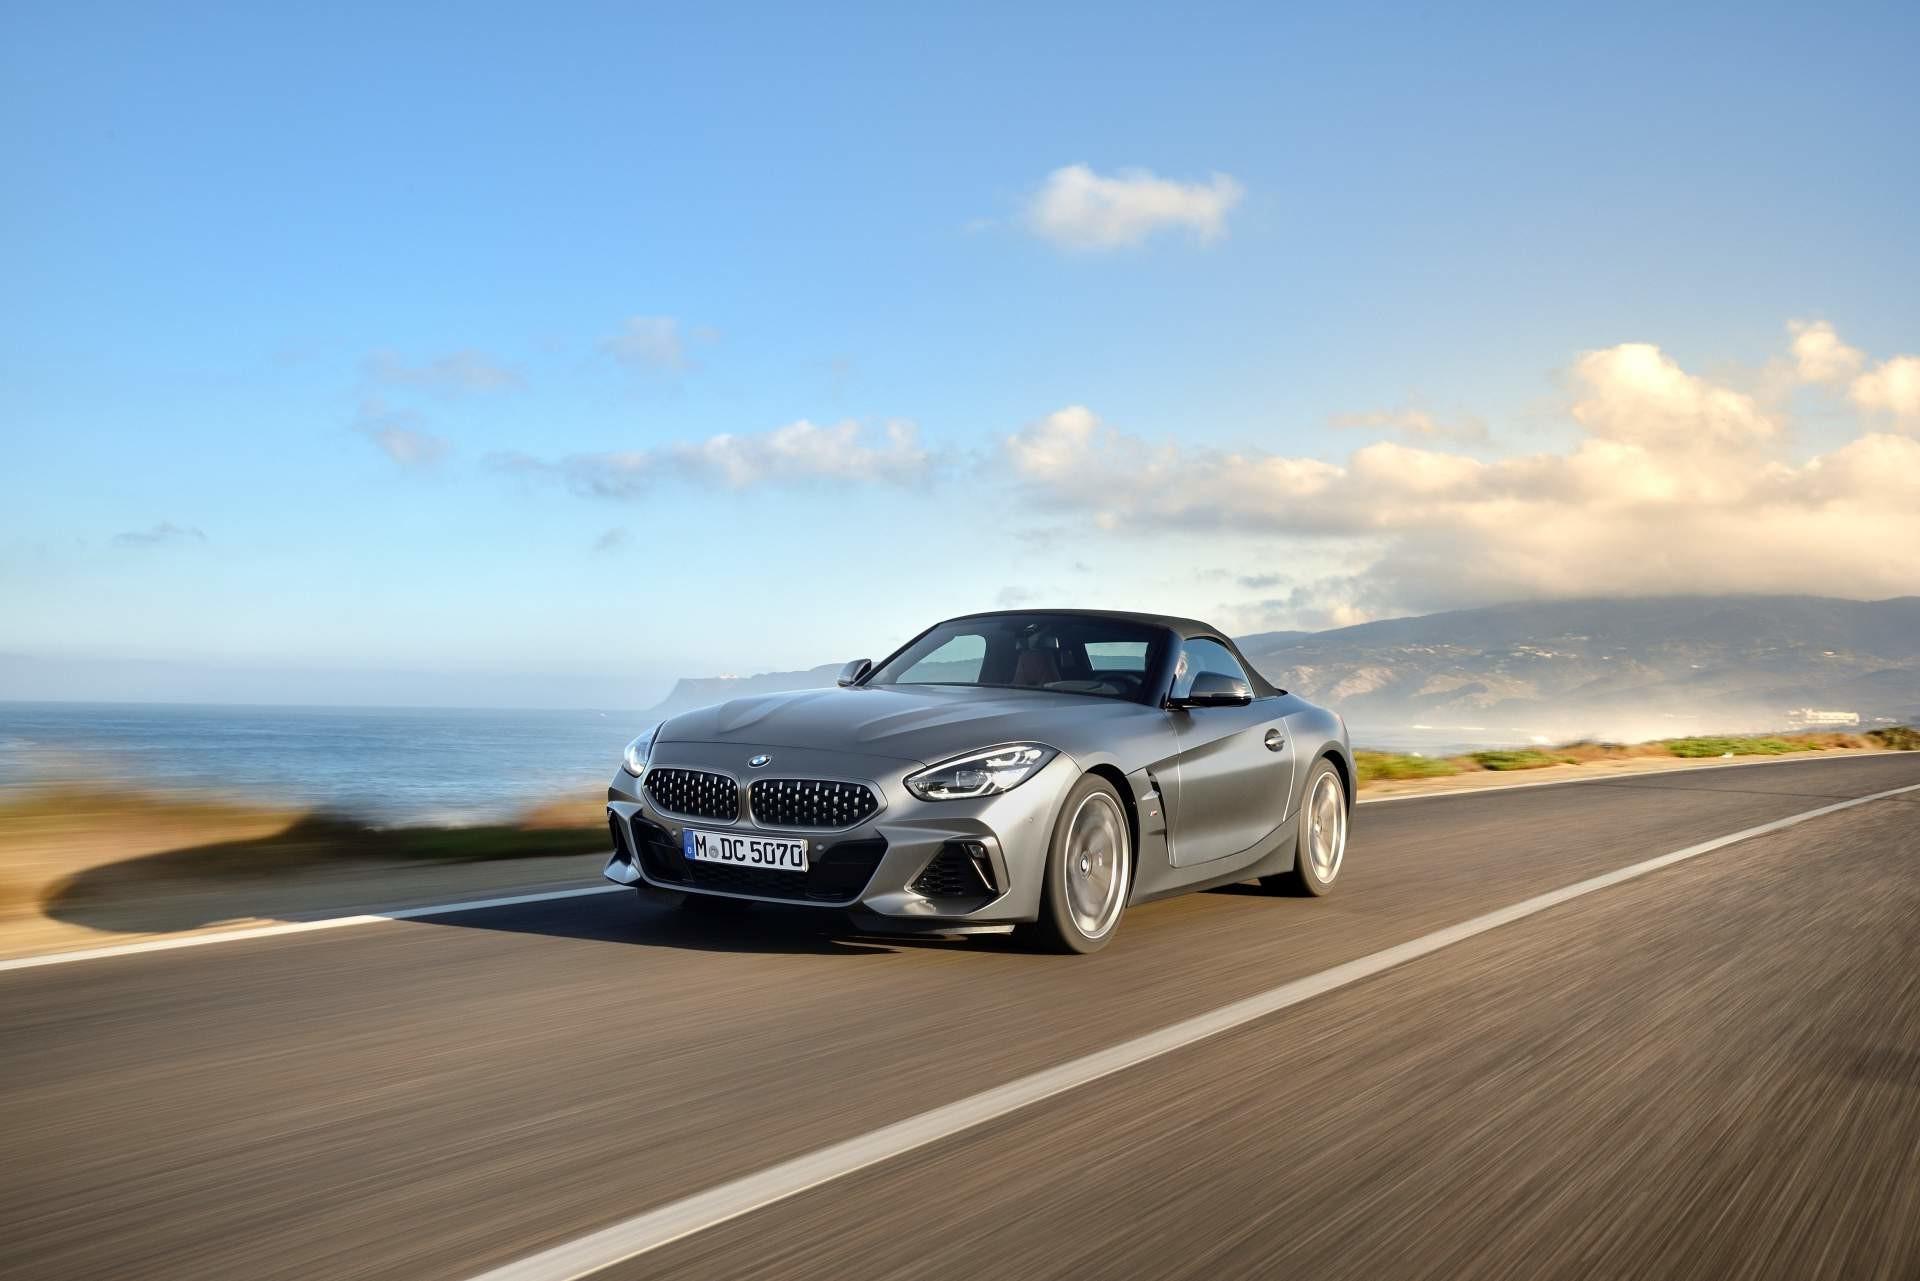 Foto de BMW Z4 M40i 2019 (11/84)